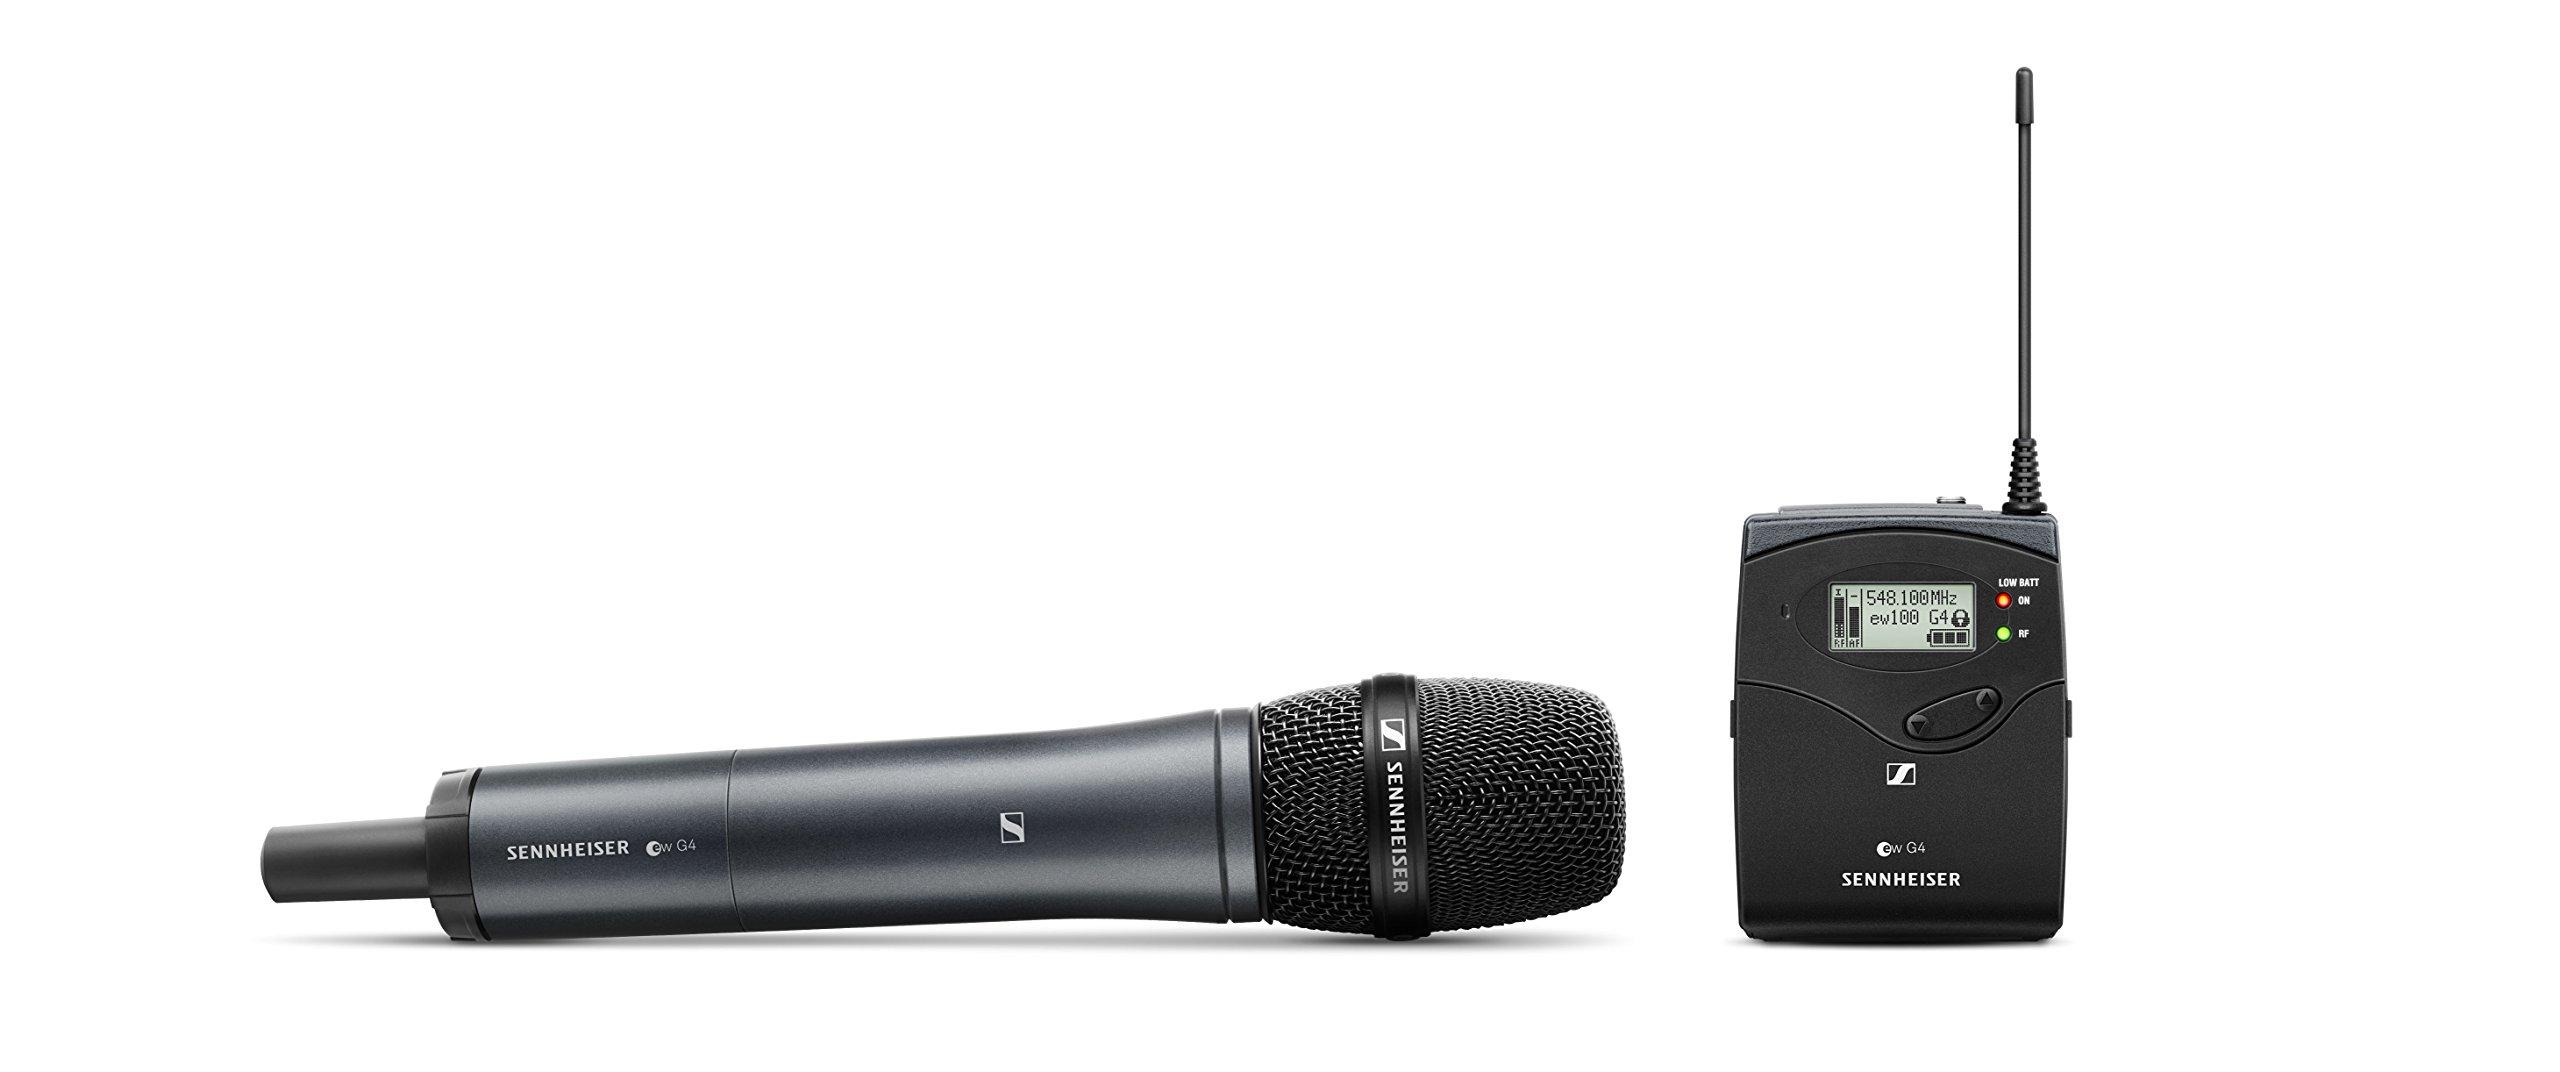 Sennheiser Pro Audio Ew 100 Portable Wireless Microphone System, G, ew 135P G4-A (ew 135P G4-A)